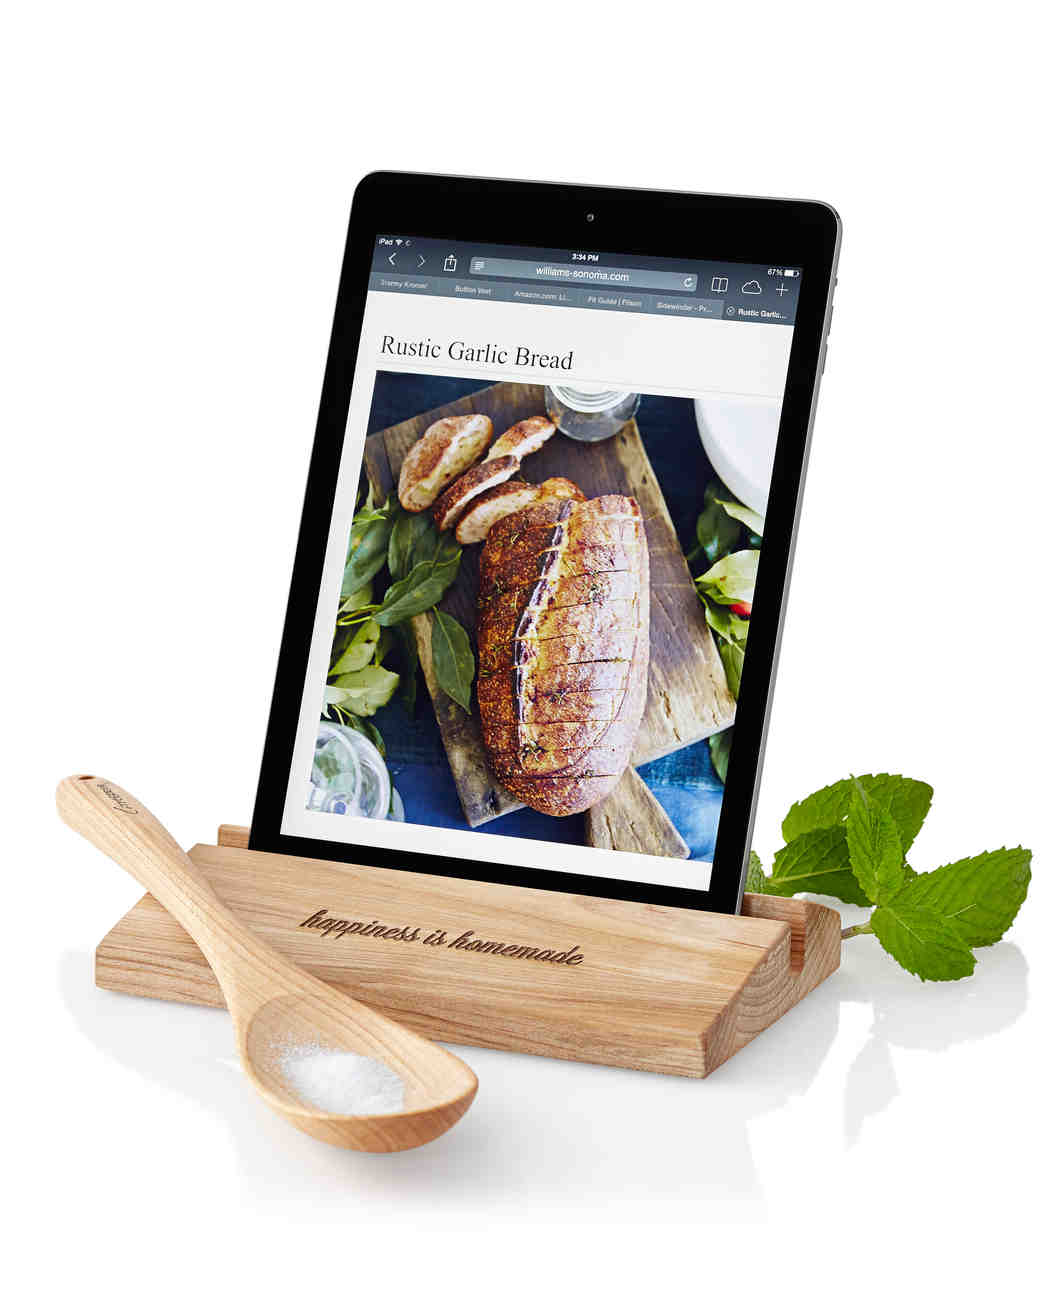 hostess-gifts-personalized-ipad-holder-1115.jpg